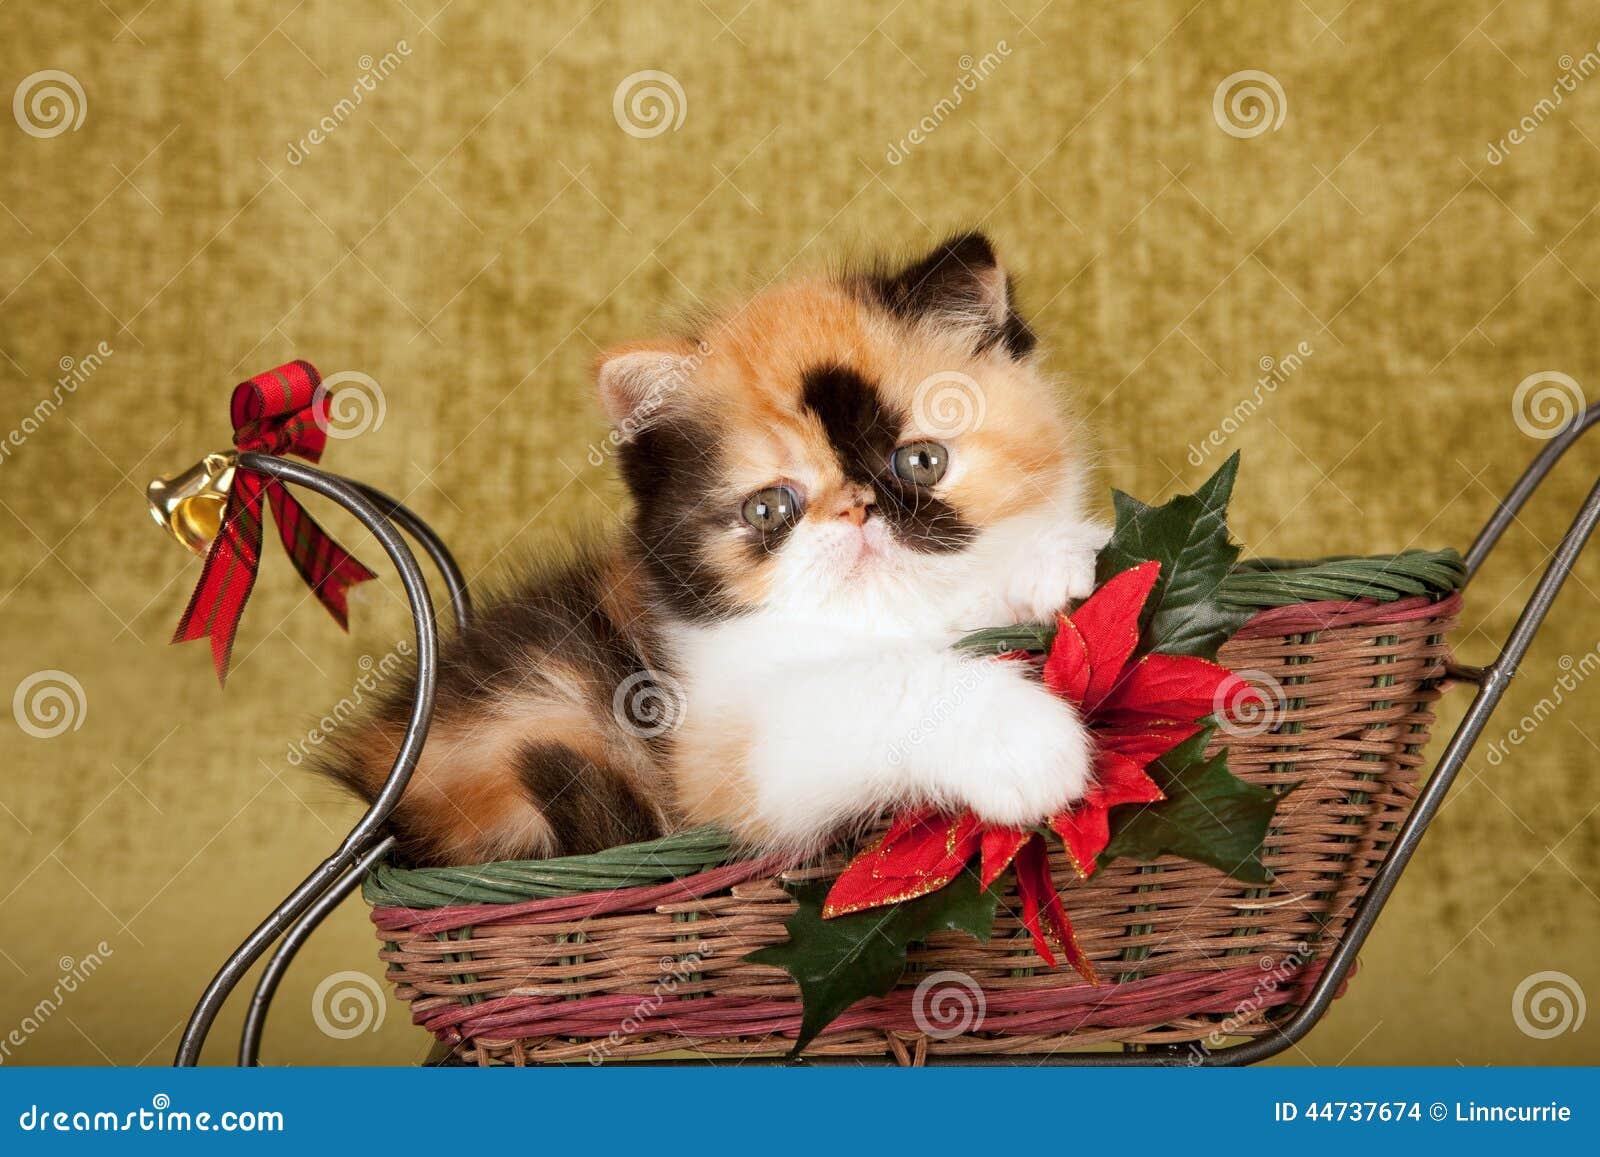 Red Calico Persian Kitten Sitting Inside Christmas Sleigh Green